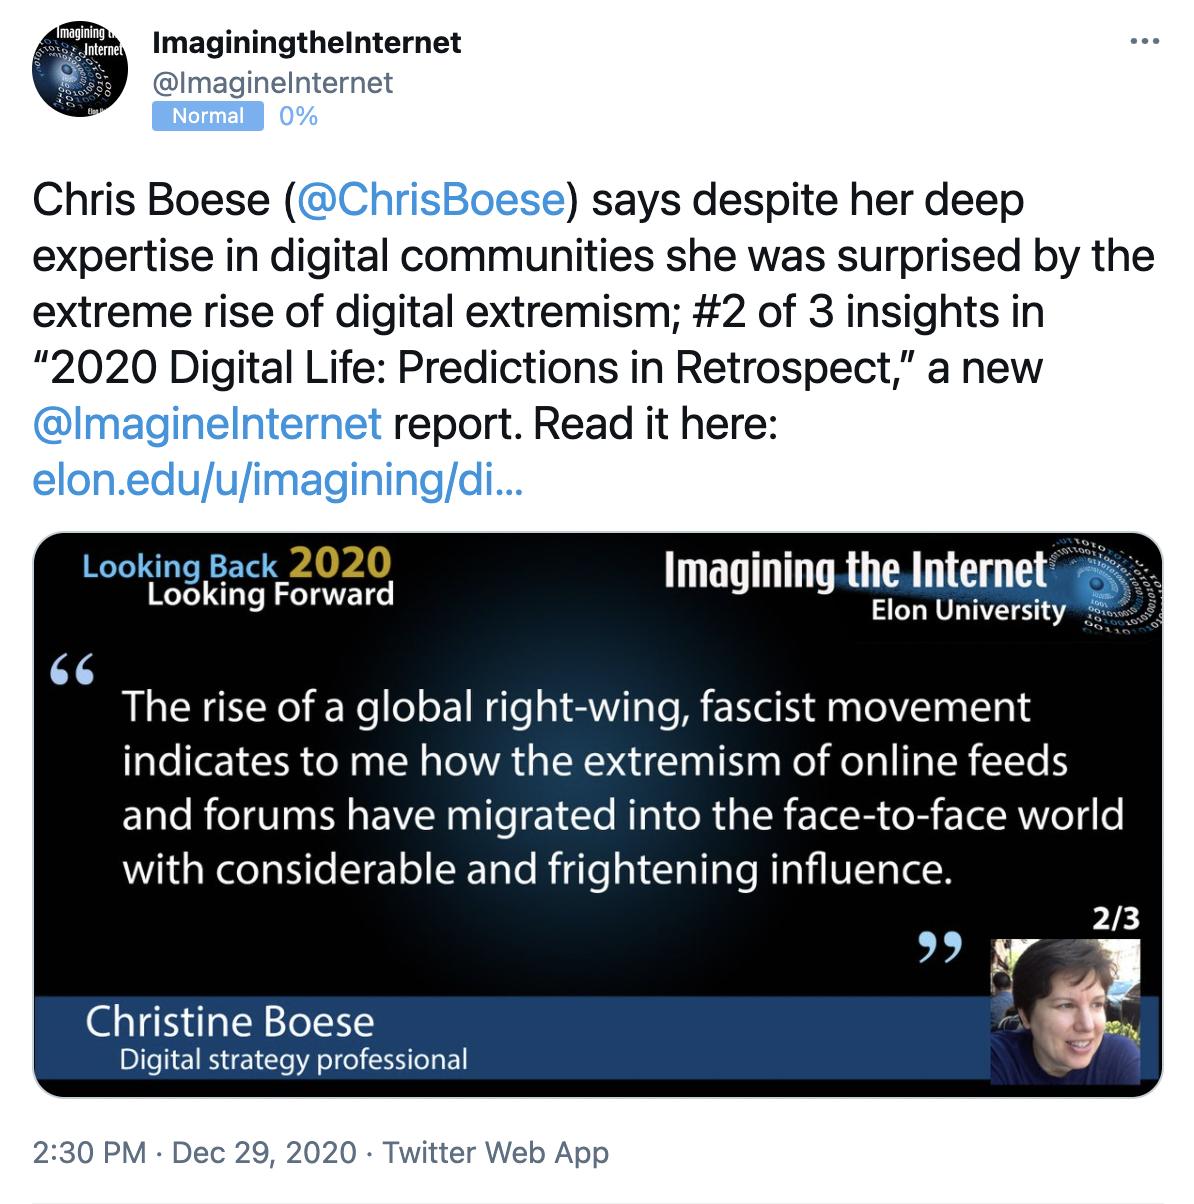 2 of 3 Insight Imagining the Internet